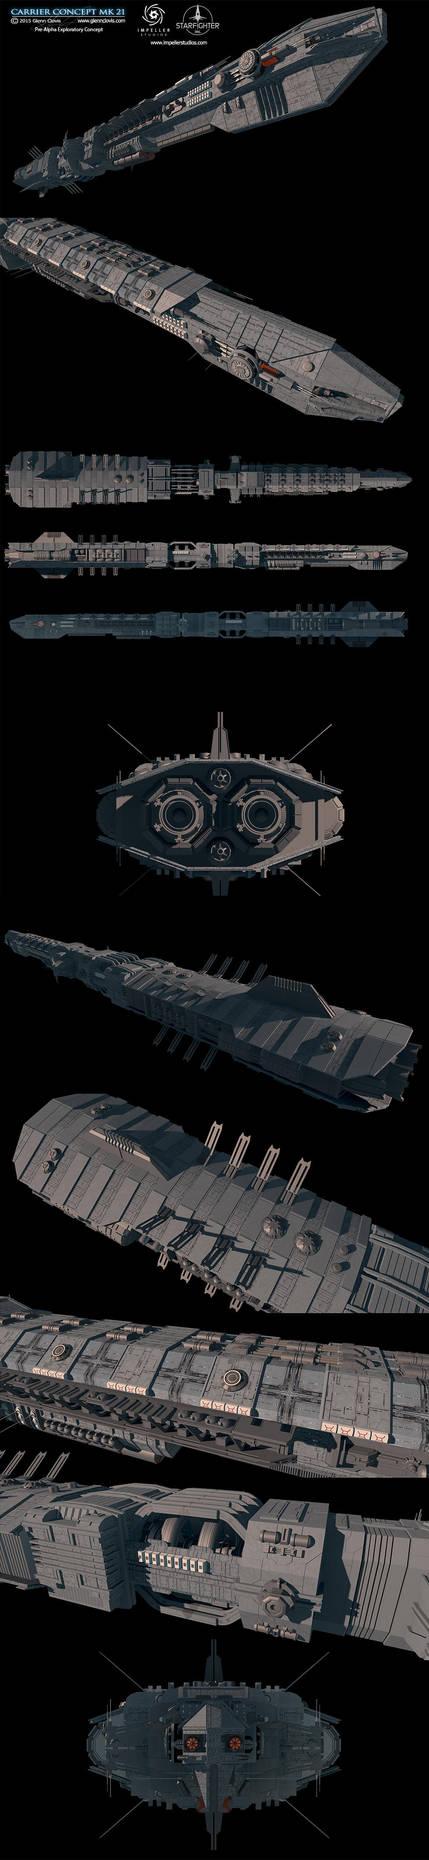 Carrier Concept-MK21 by GlennClovis